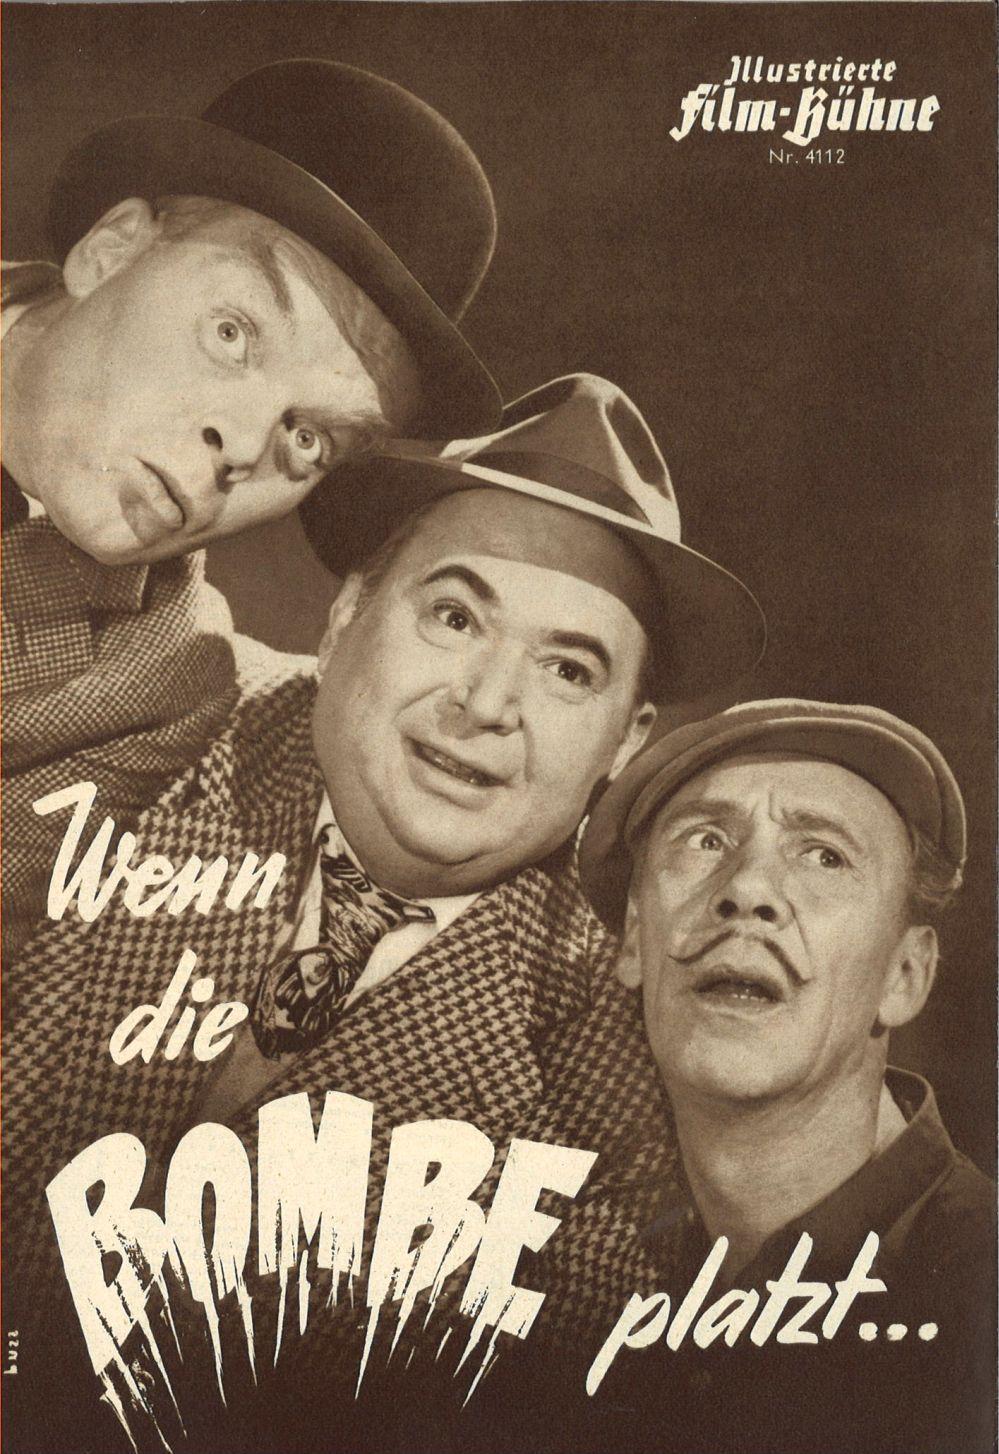 Oskar Sima, Rudolf Platte, and Hans Richter in Wenn die Bombe platzt (1958)